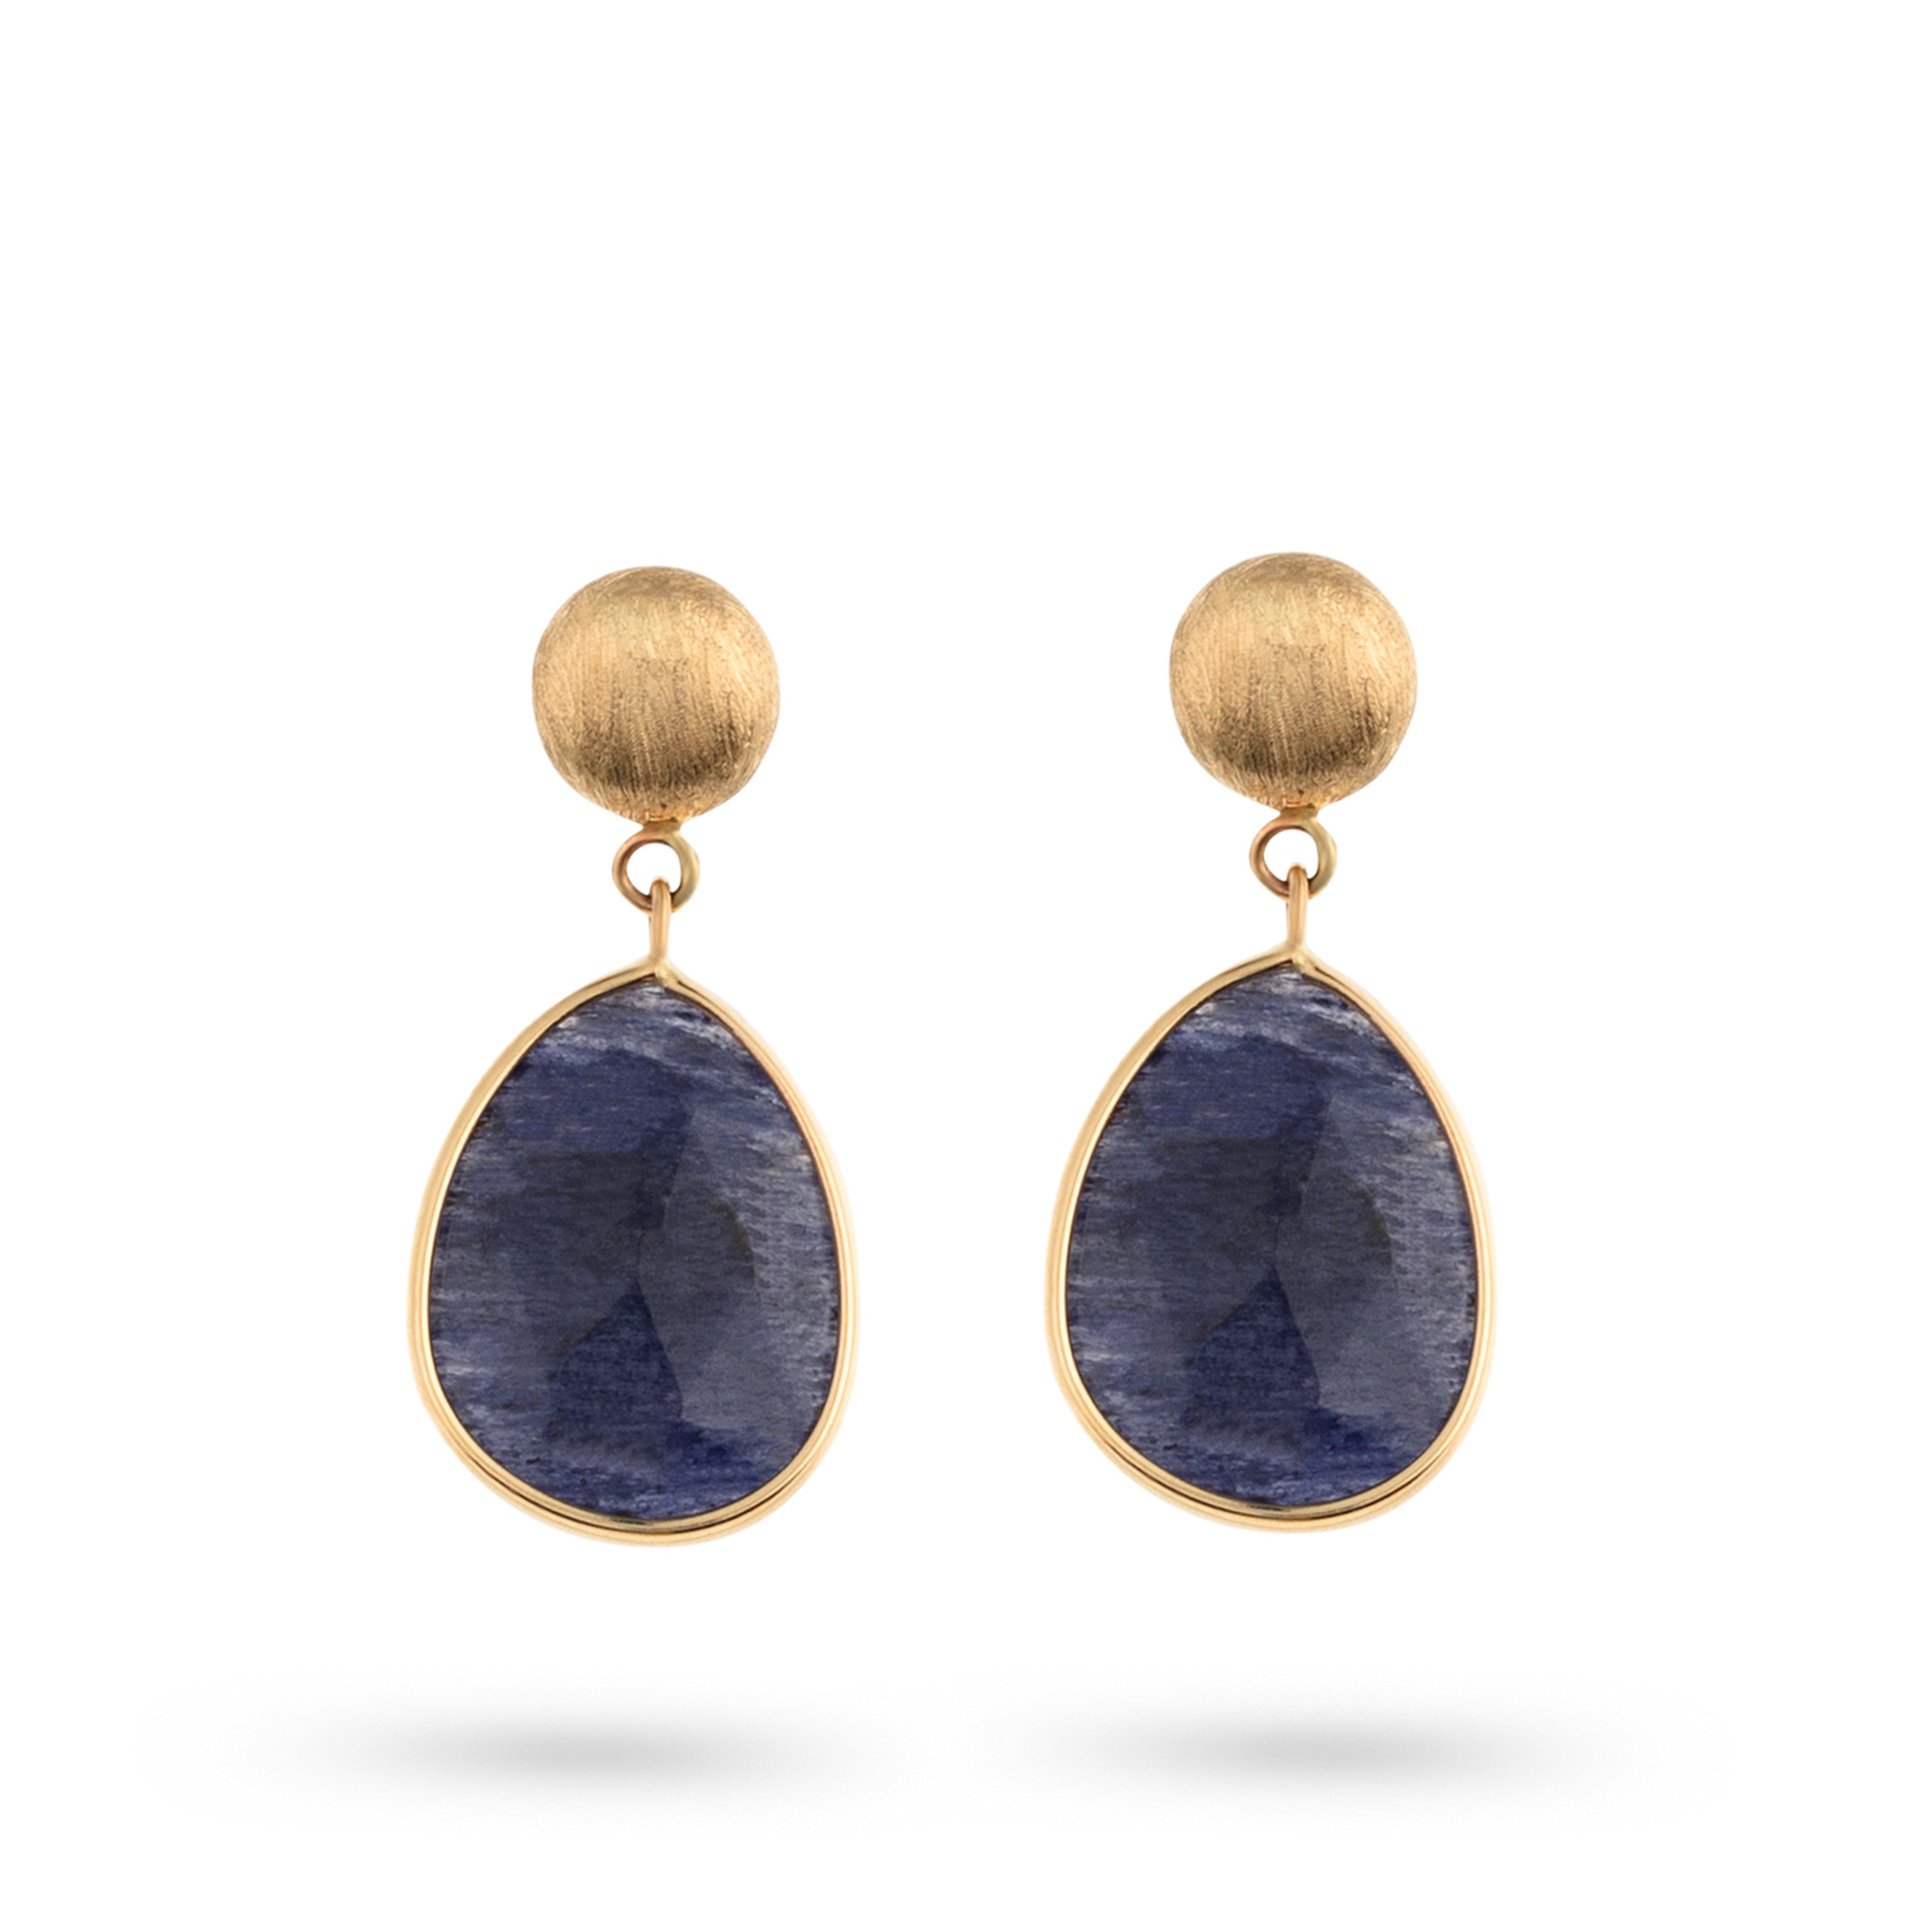 Italo Bottene Italo Bottene Tinta  oorhangers met blauwe quartz